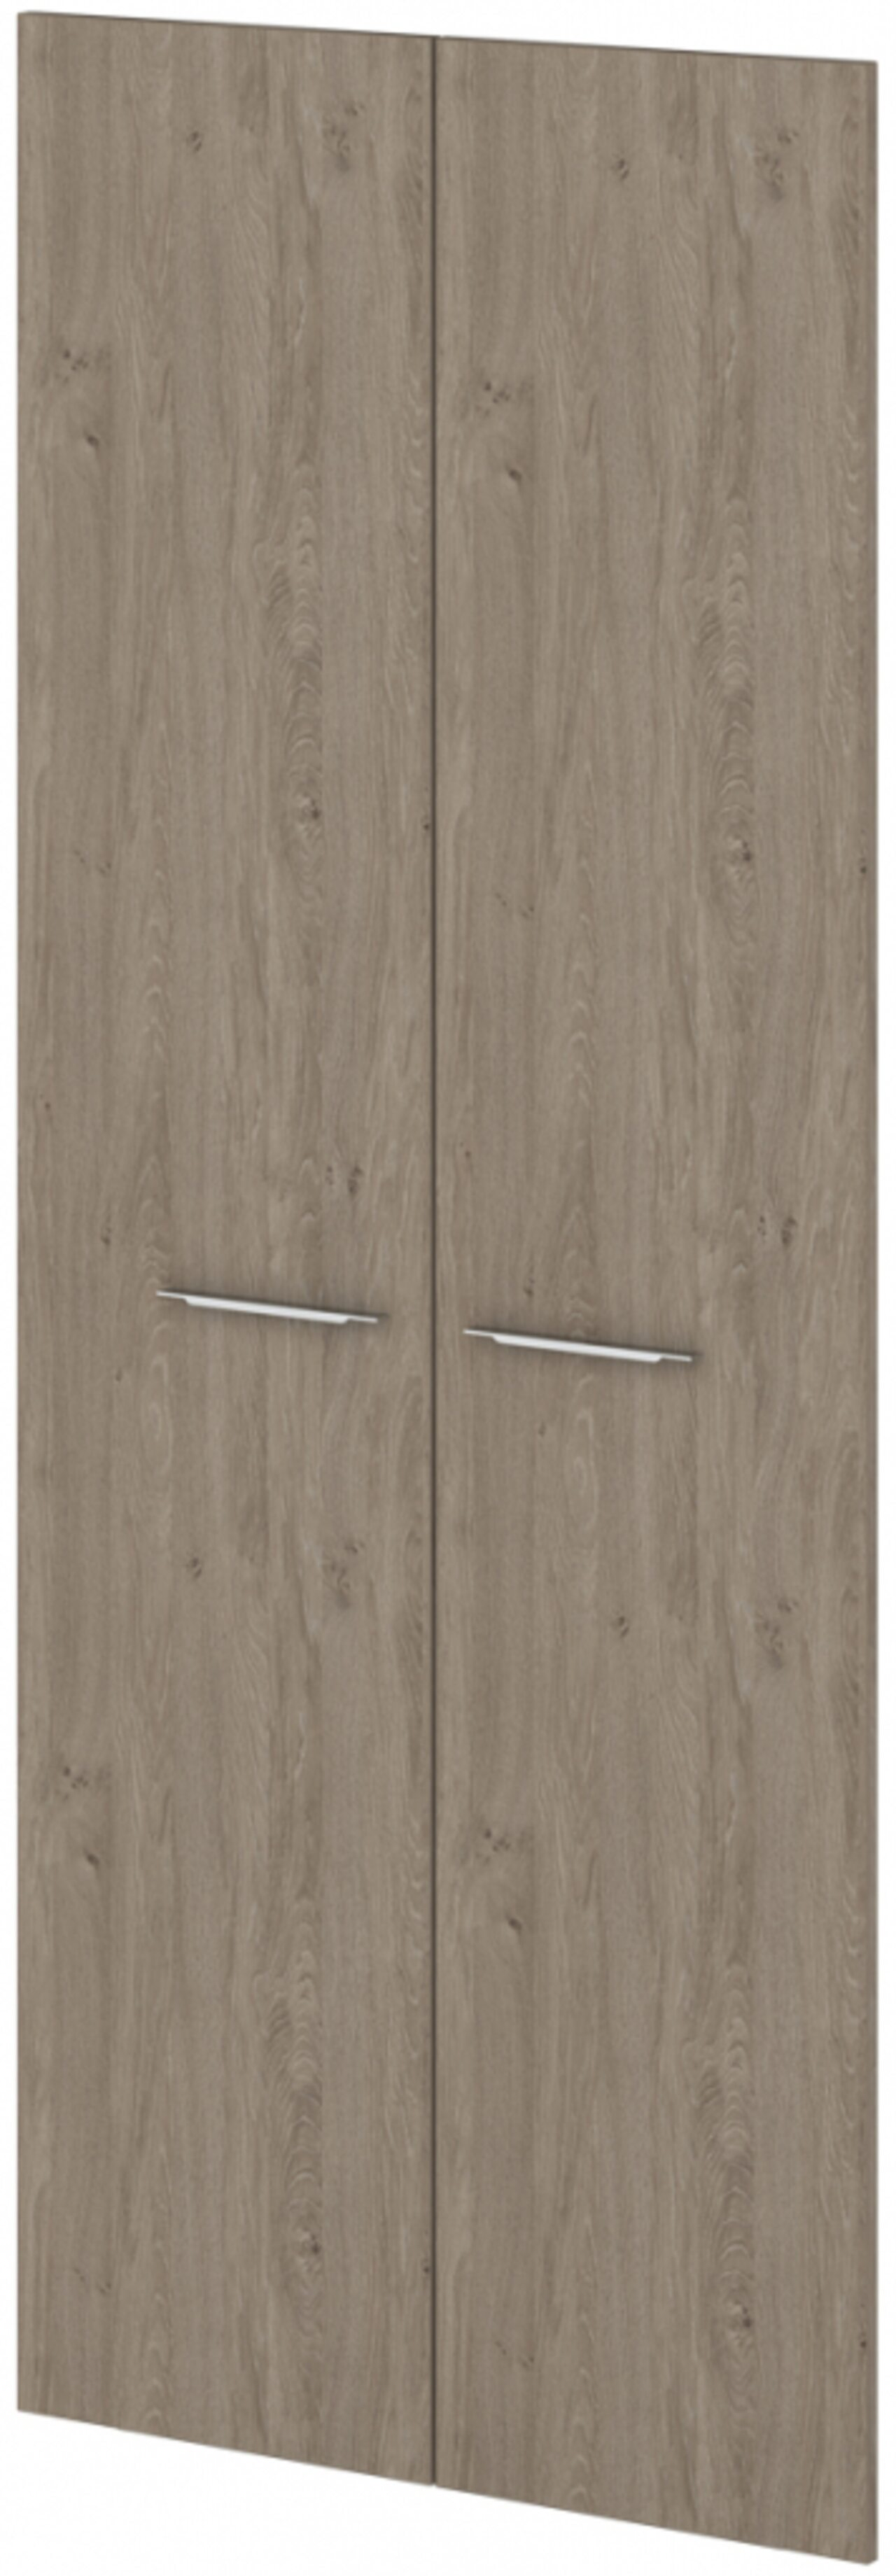 Двери ЛДСП высокие  Grandeza 2x90x221 - фото 4